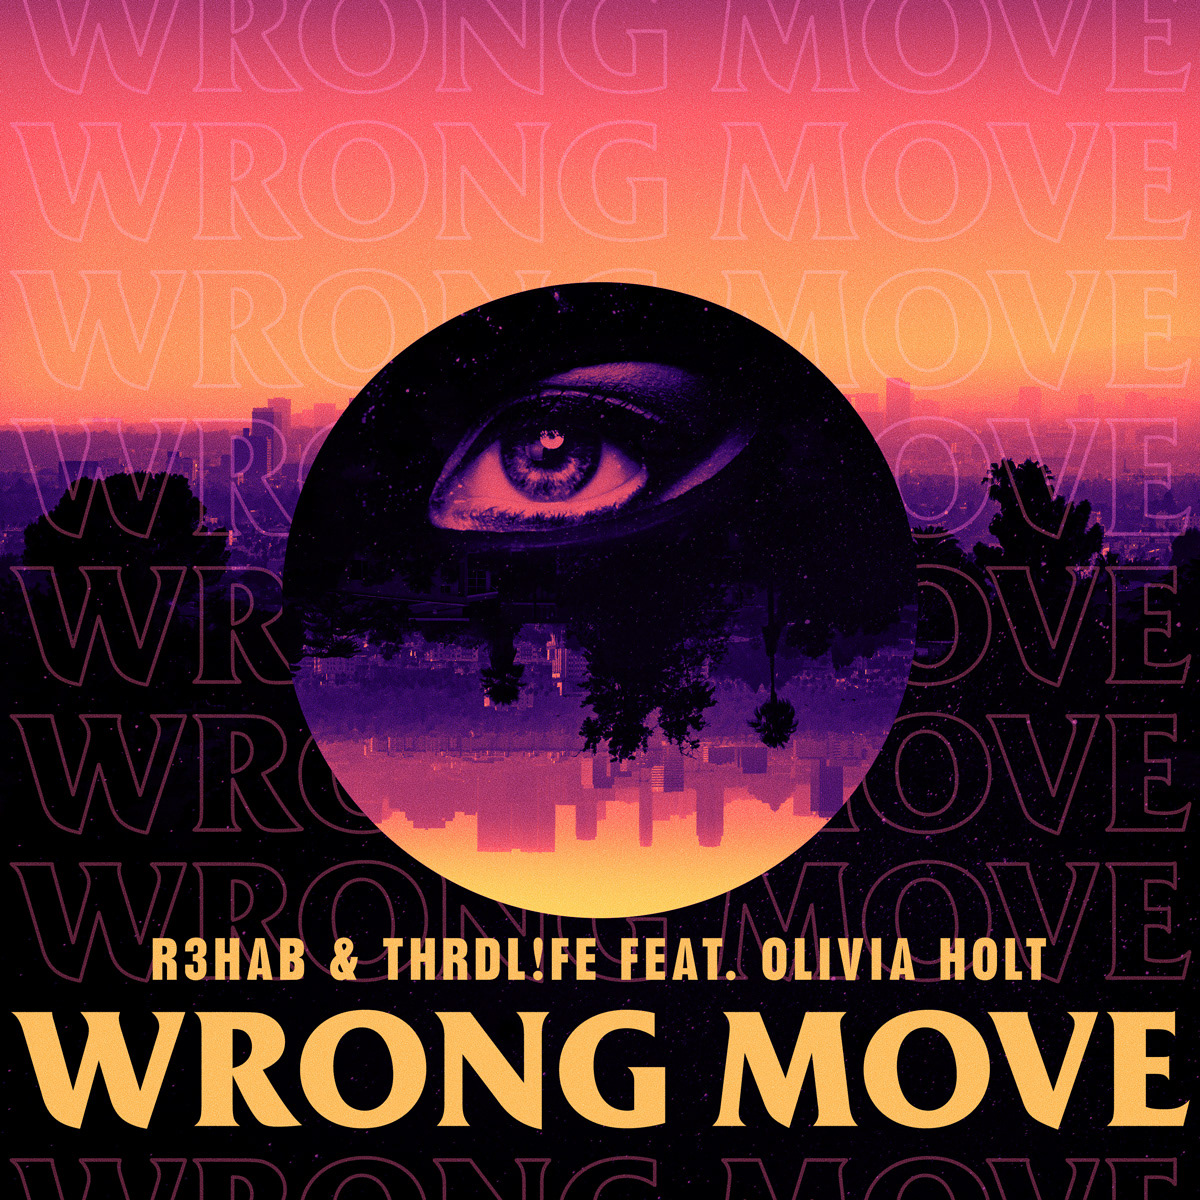 Wrong Move single artwork